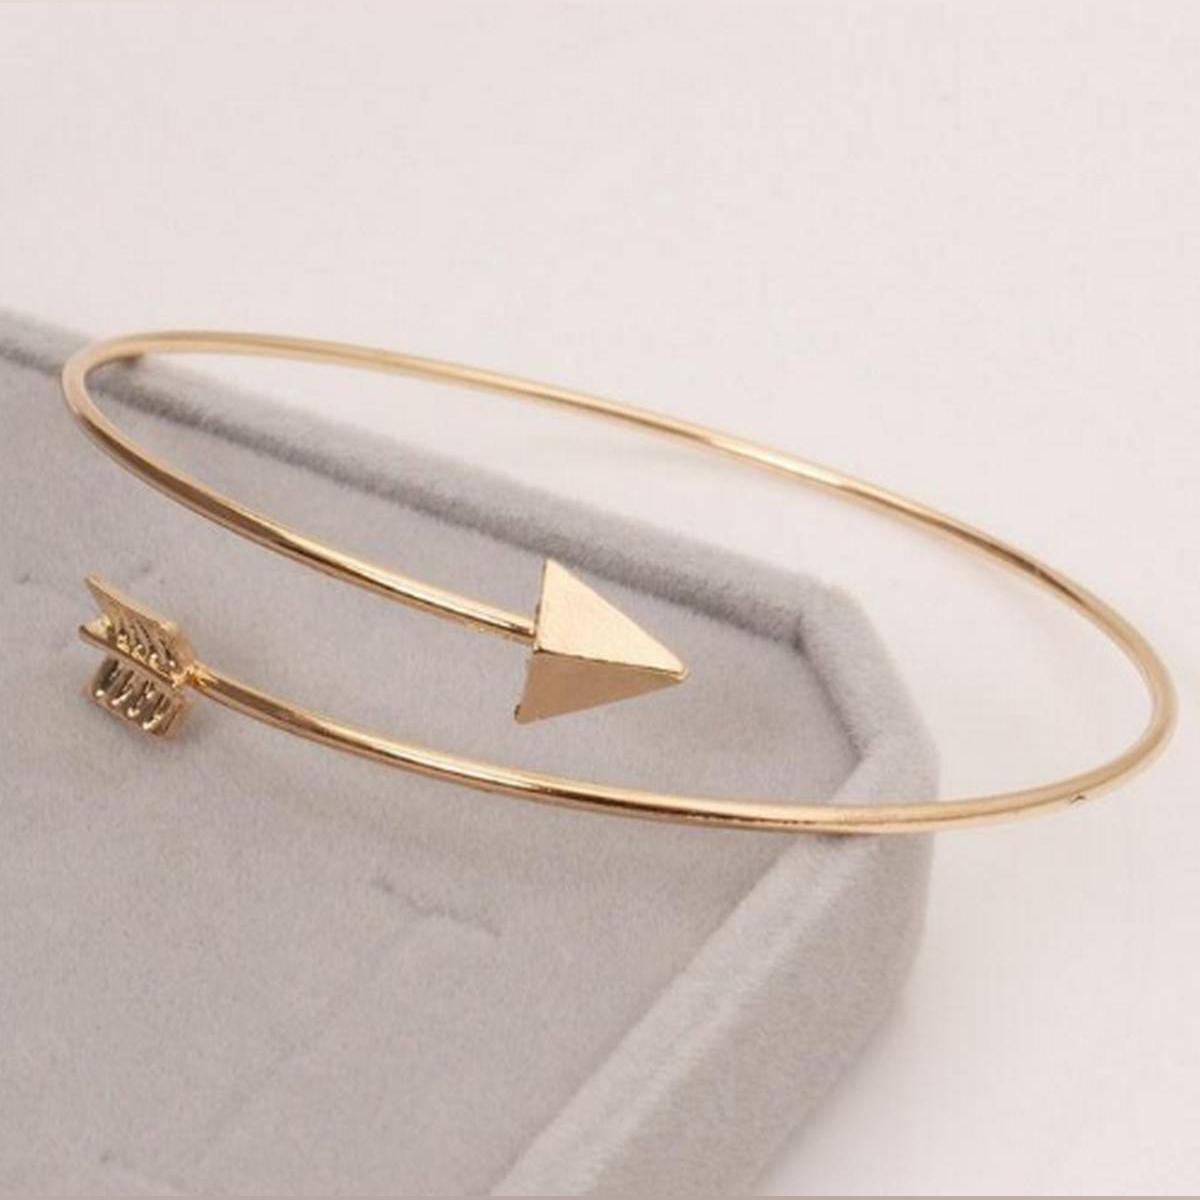 New Hot Fashion Adjustable Arrow Bangles Bracelets for Women Vintage Gold Color Zopika Store